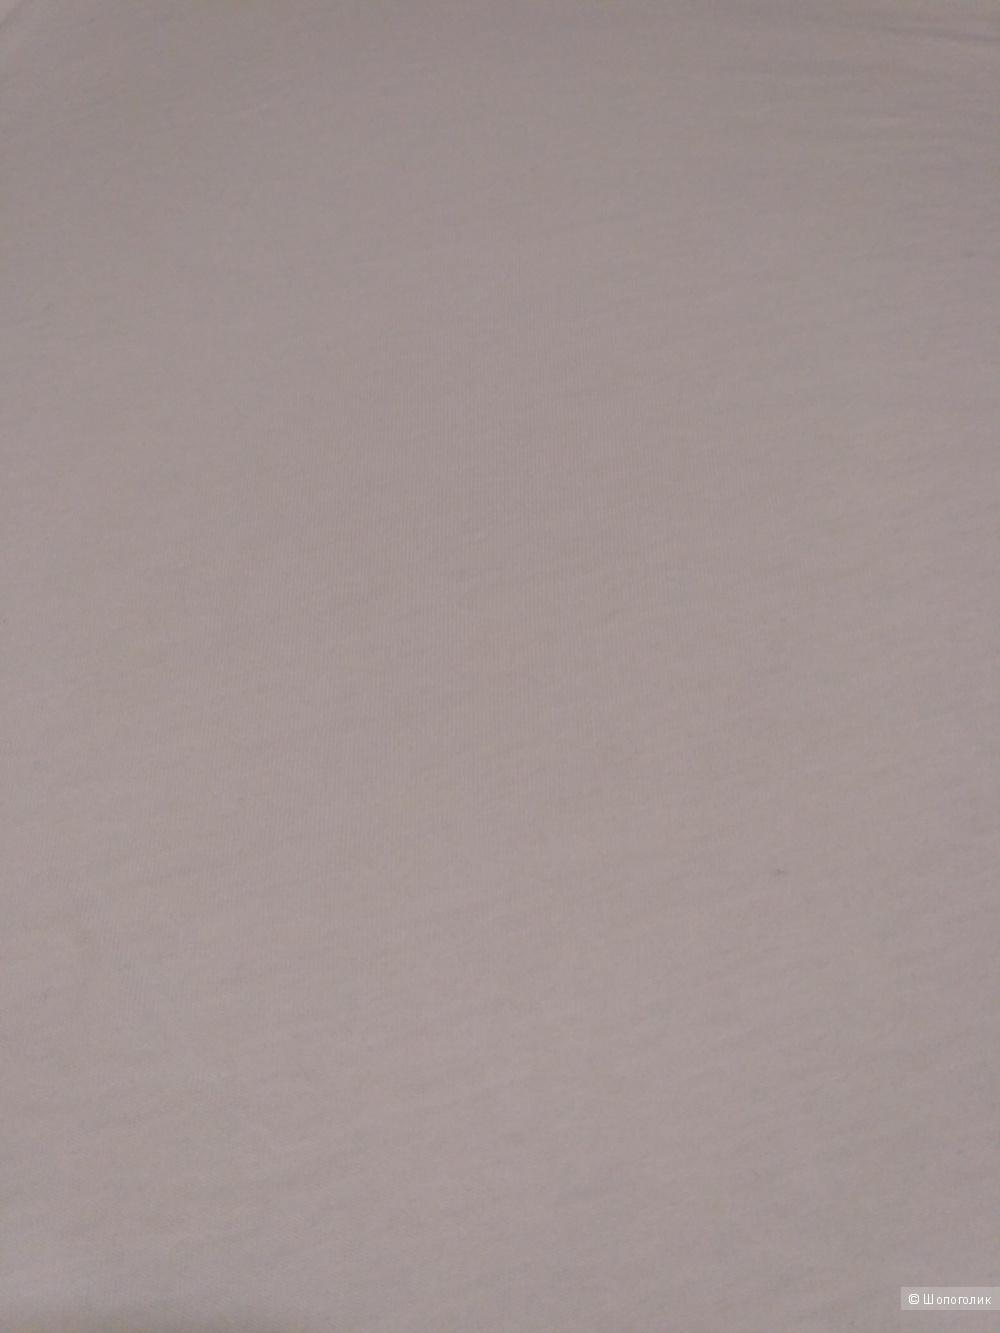 Футболка Massimo Dutti, размер M